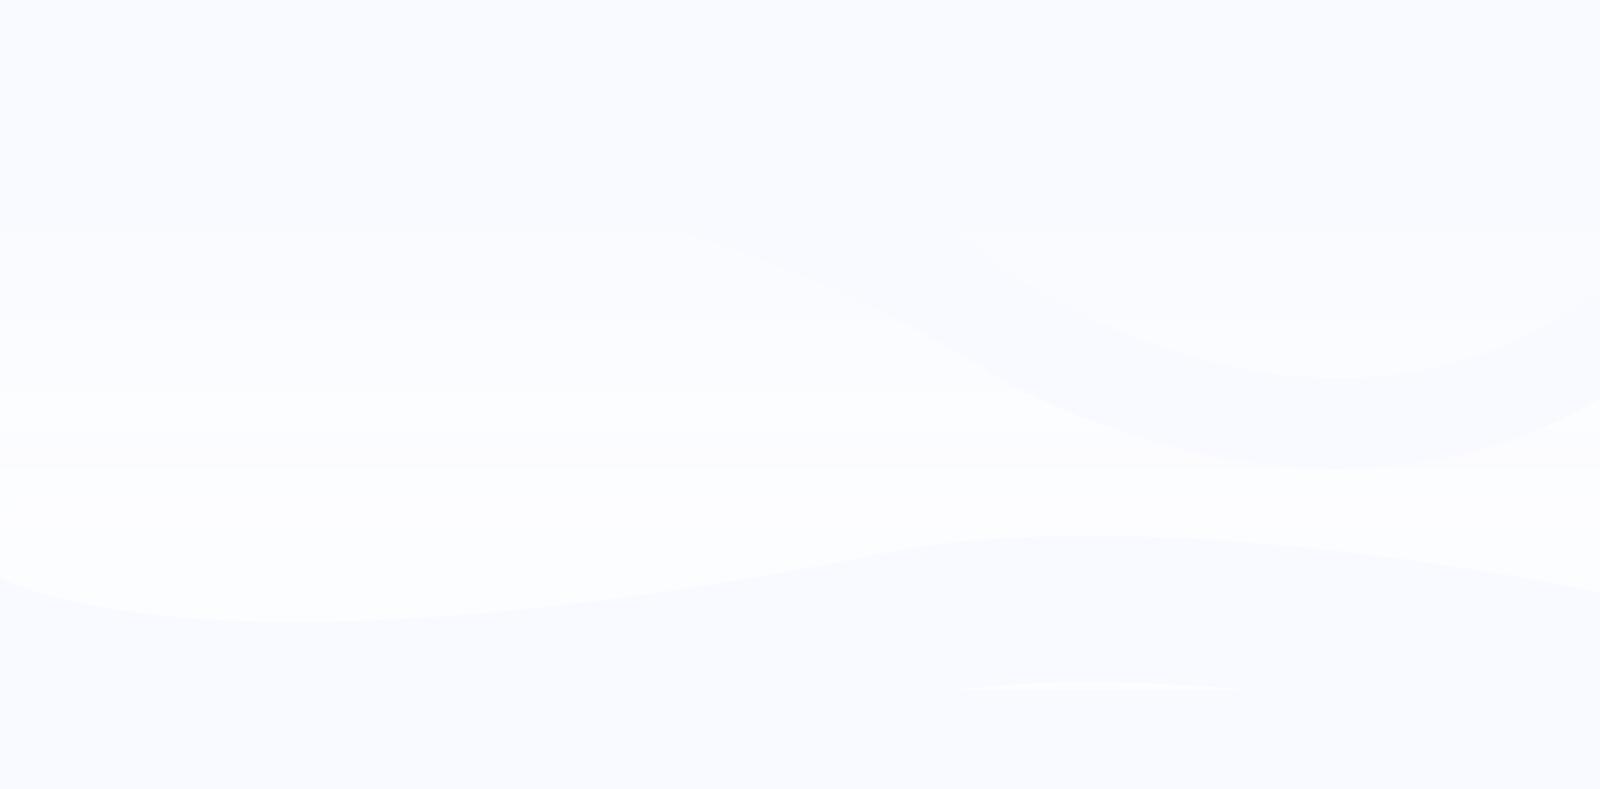 talkie-image